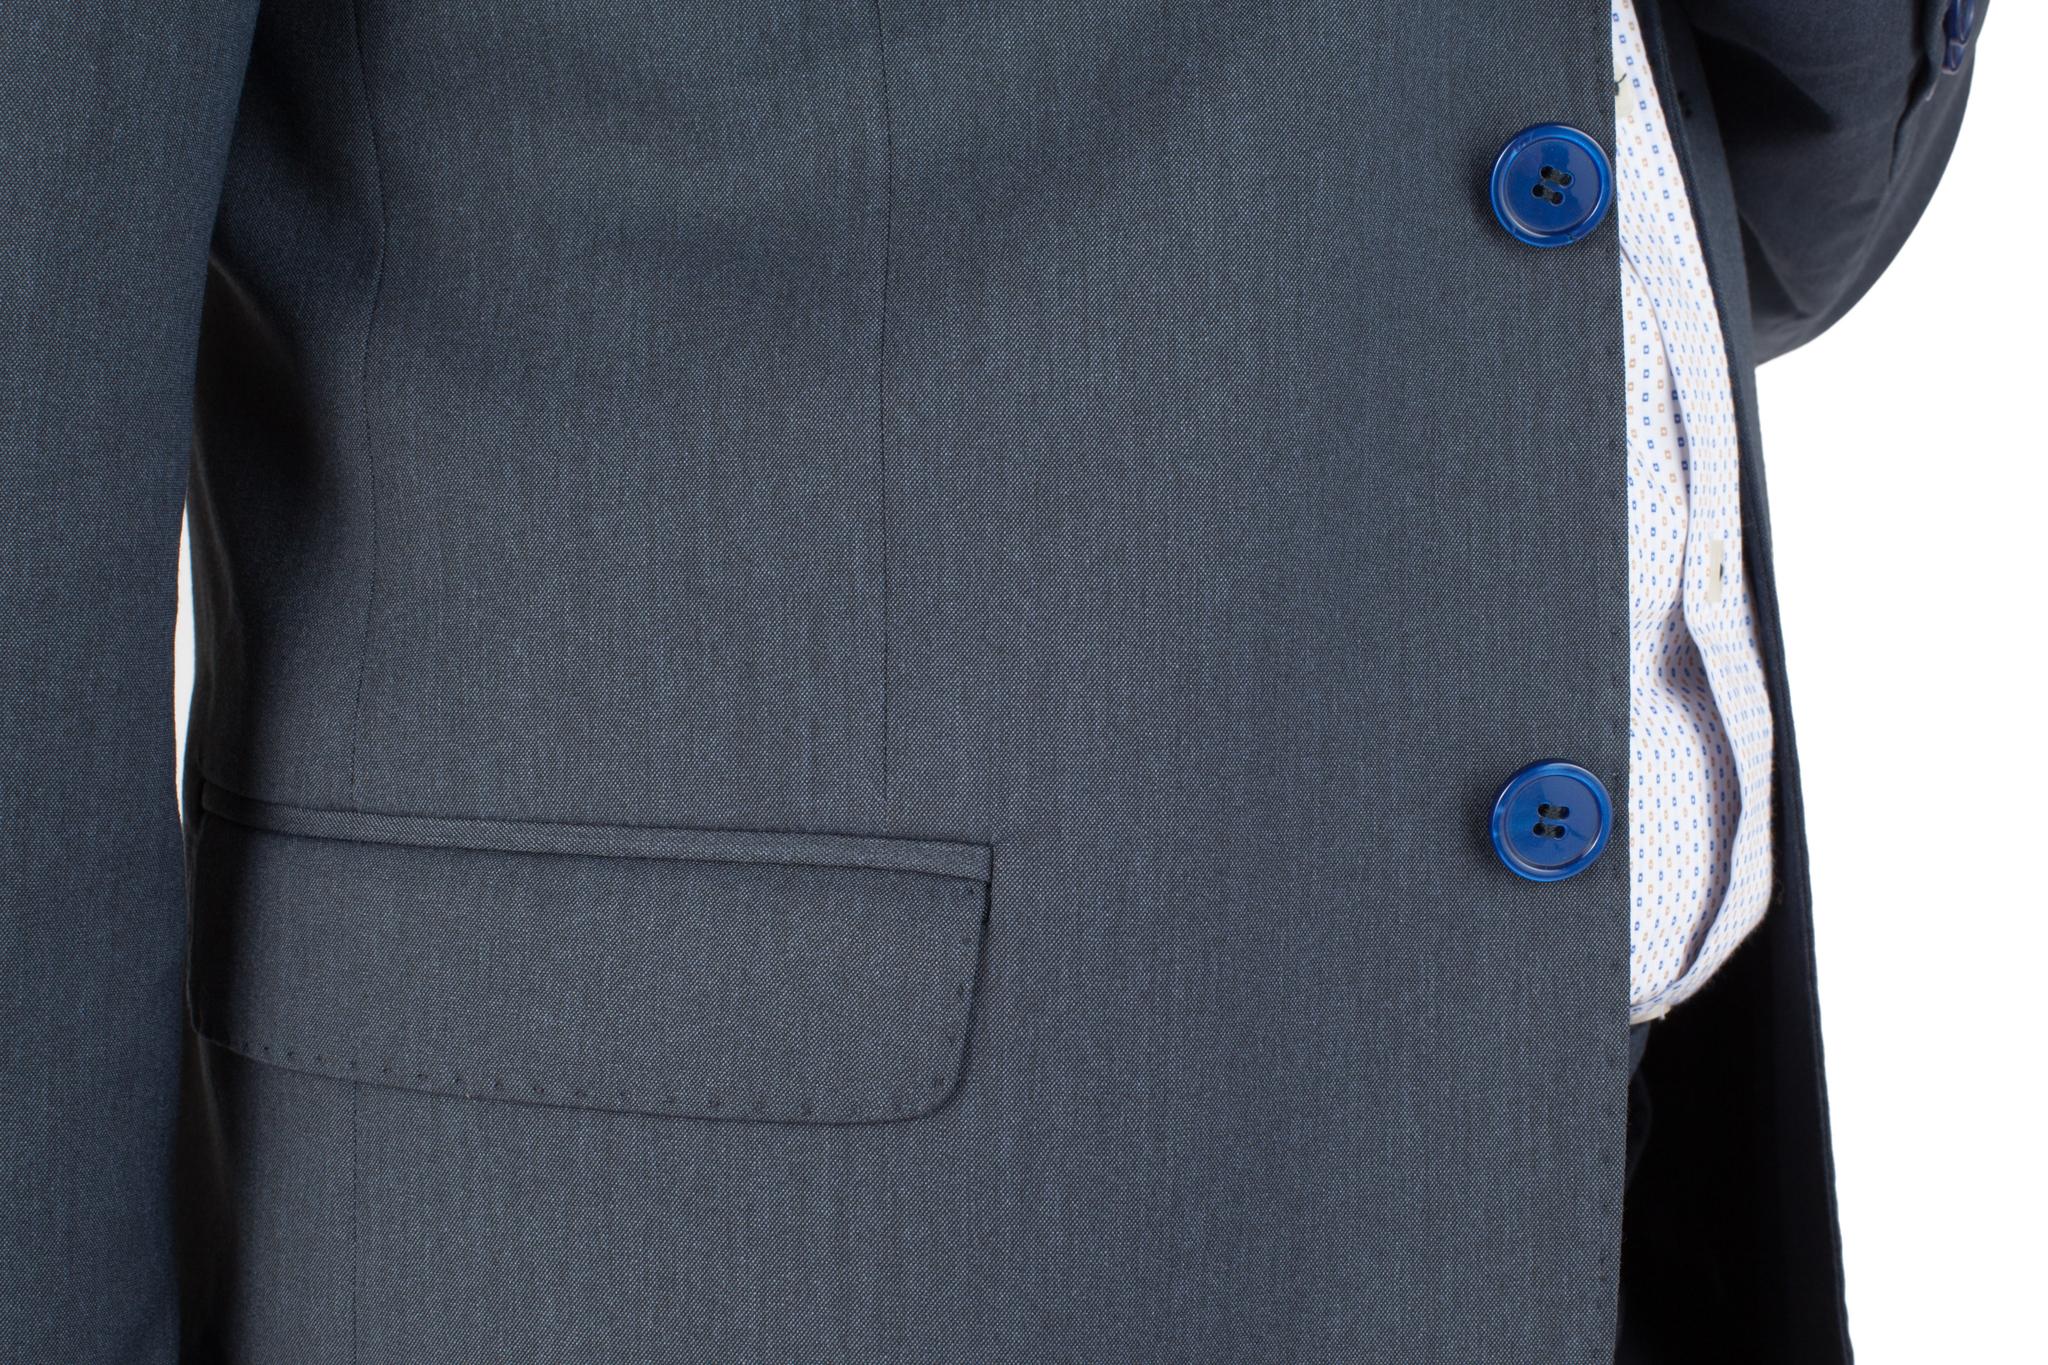 Тёмно-синий шерстяной костюм, накладной карман